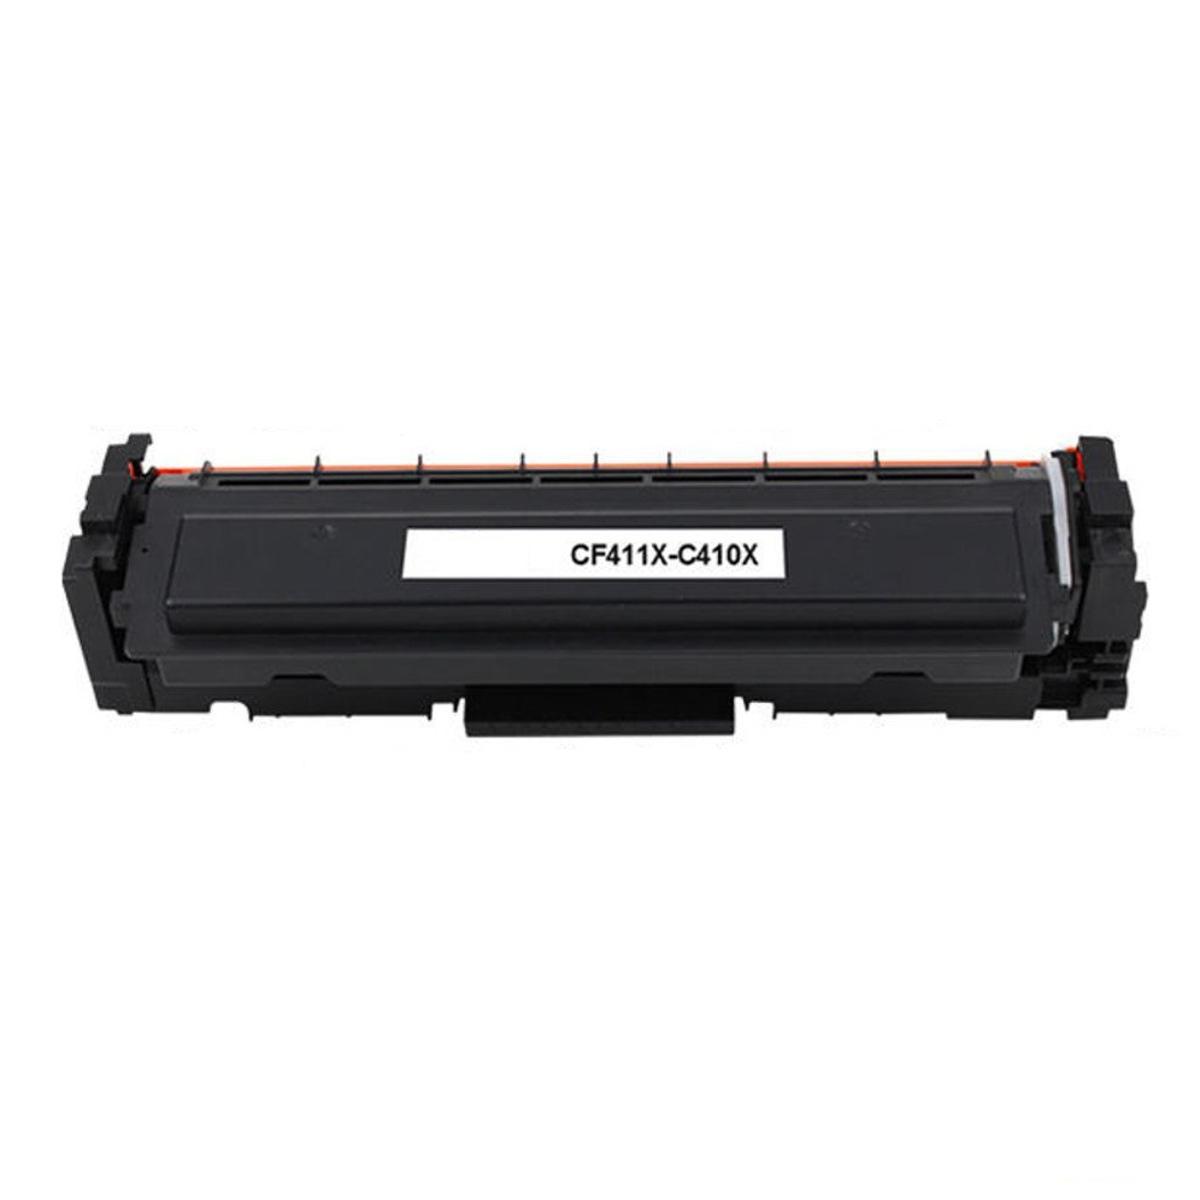 Compatible HP 410X CF411X Cyan Toner Cartridge High Yield- Economical Box